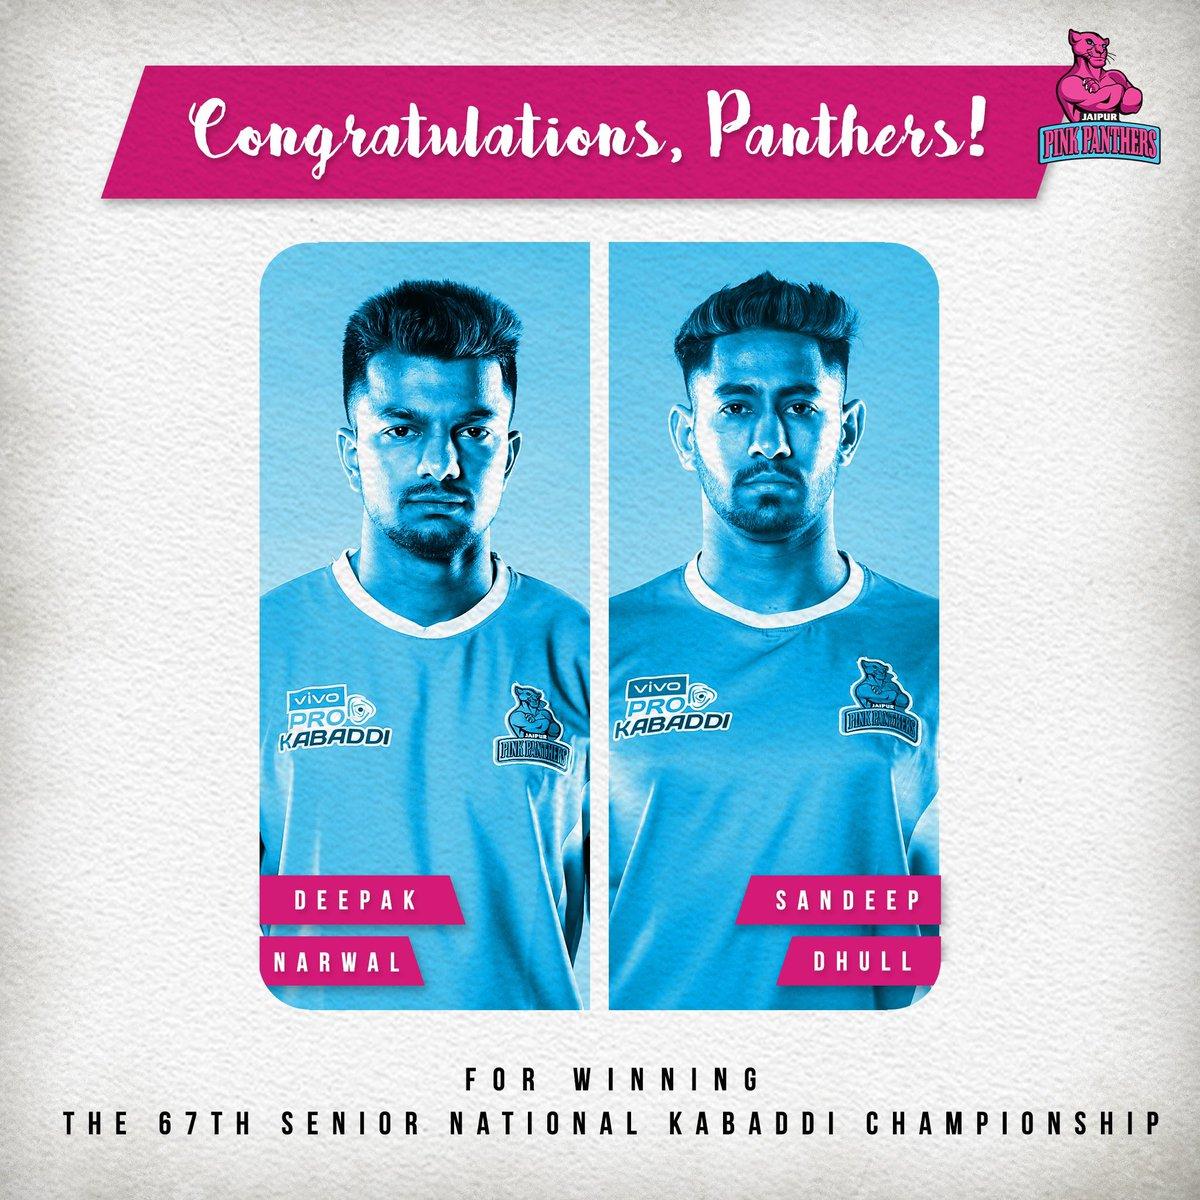 Deepak Narwal and Sandeep Dhull, members of the #PantherSquad representing Indian Railways have clinched the 67th Senior National Kabaddi Championships 💪🏻  Congratulations #Panthers 👏🏻  #SeniorNationals #Kabaddi #ProKabaddi #Jaipur #RoarForPanthers #JaiHanuman #PKL